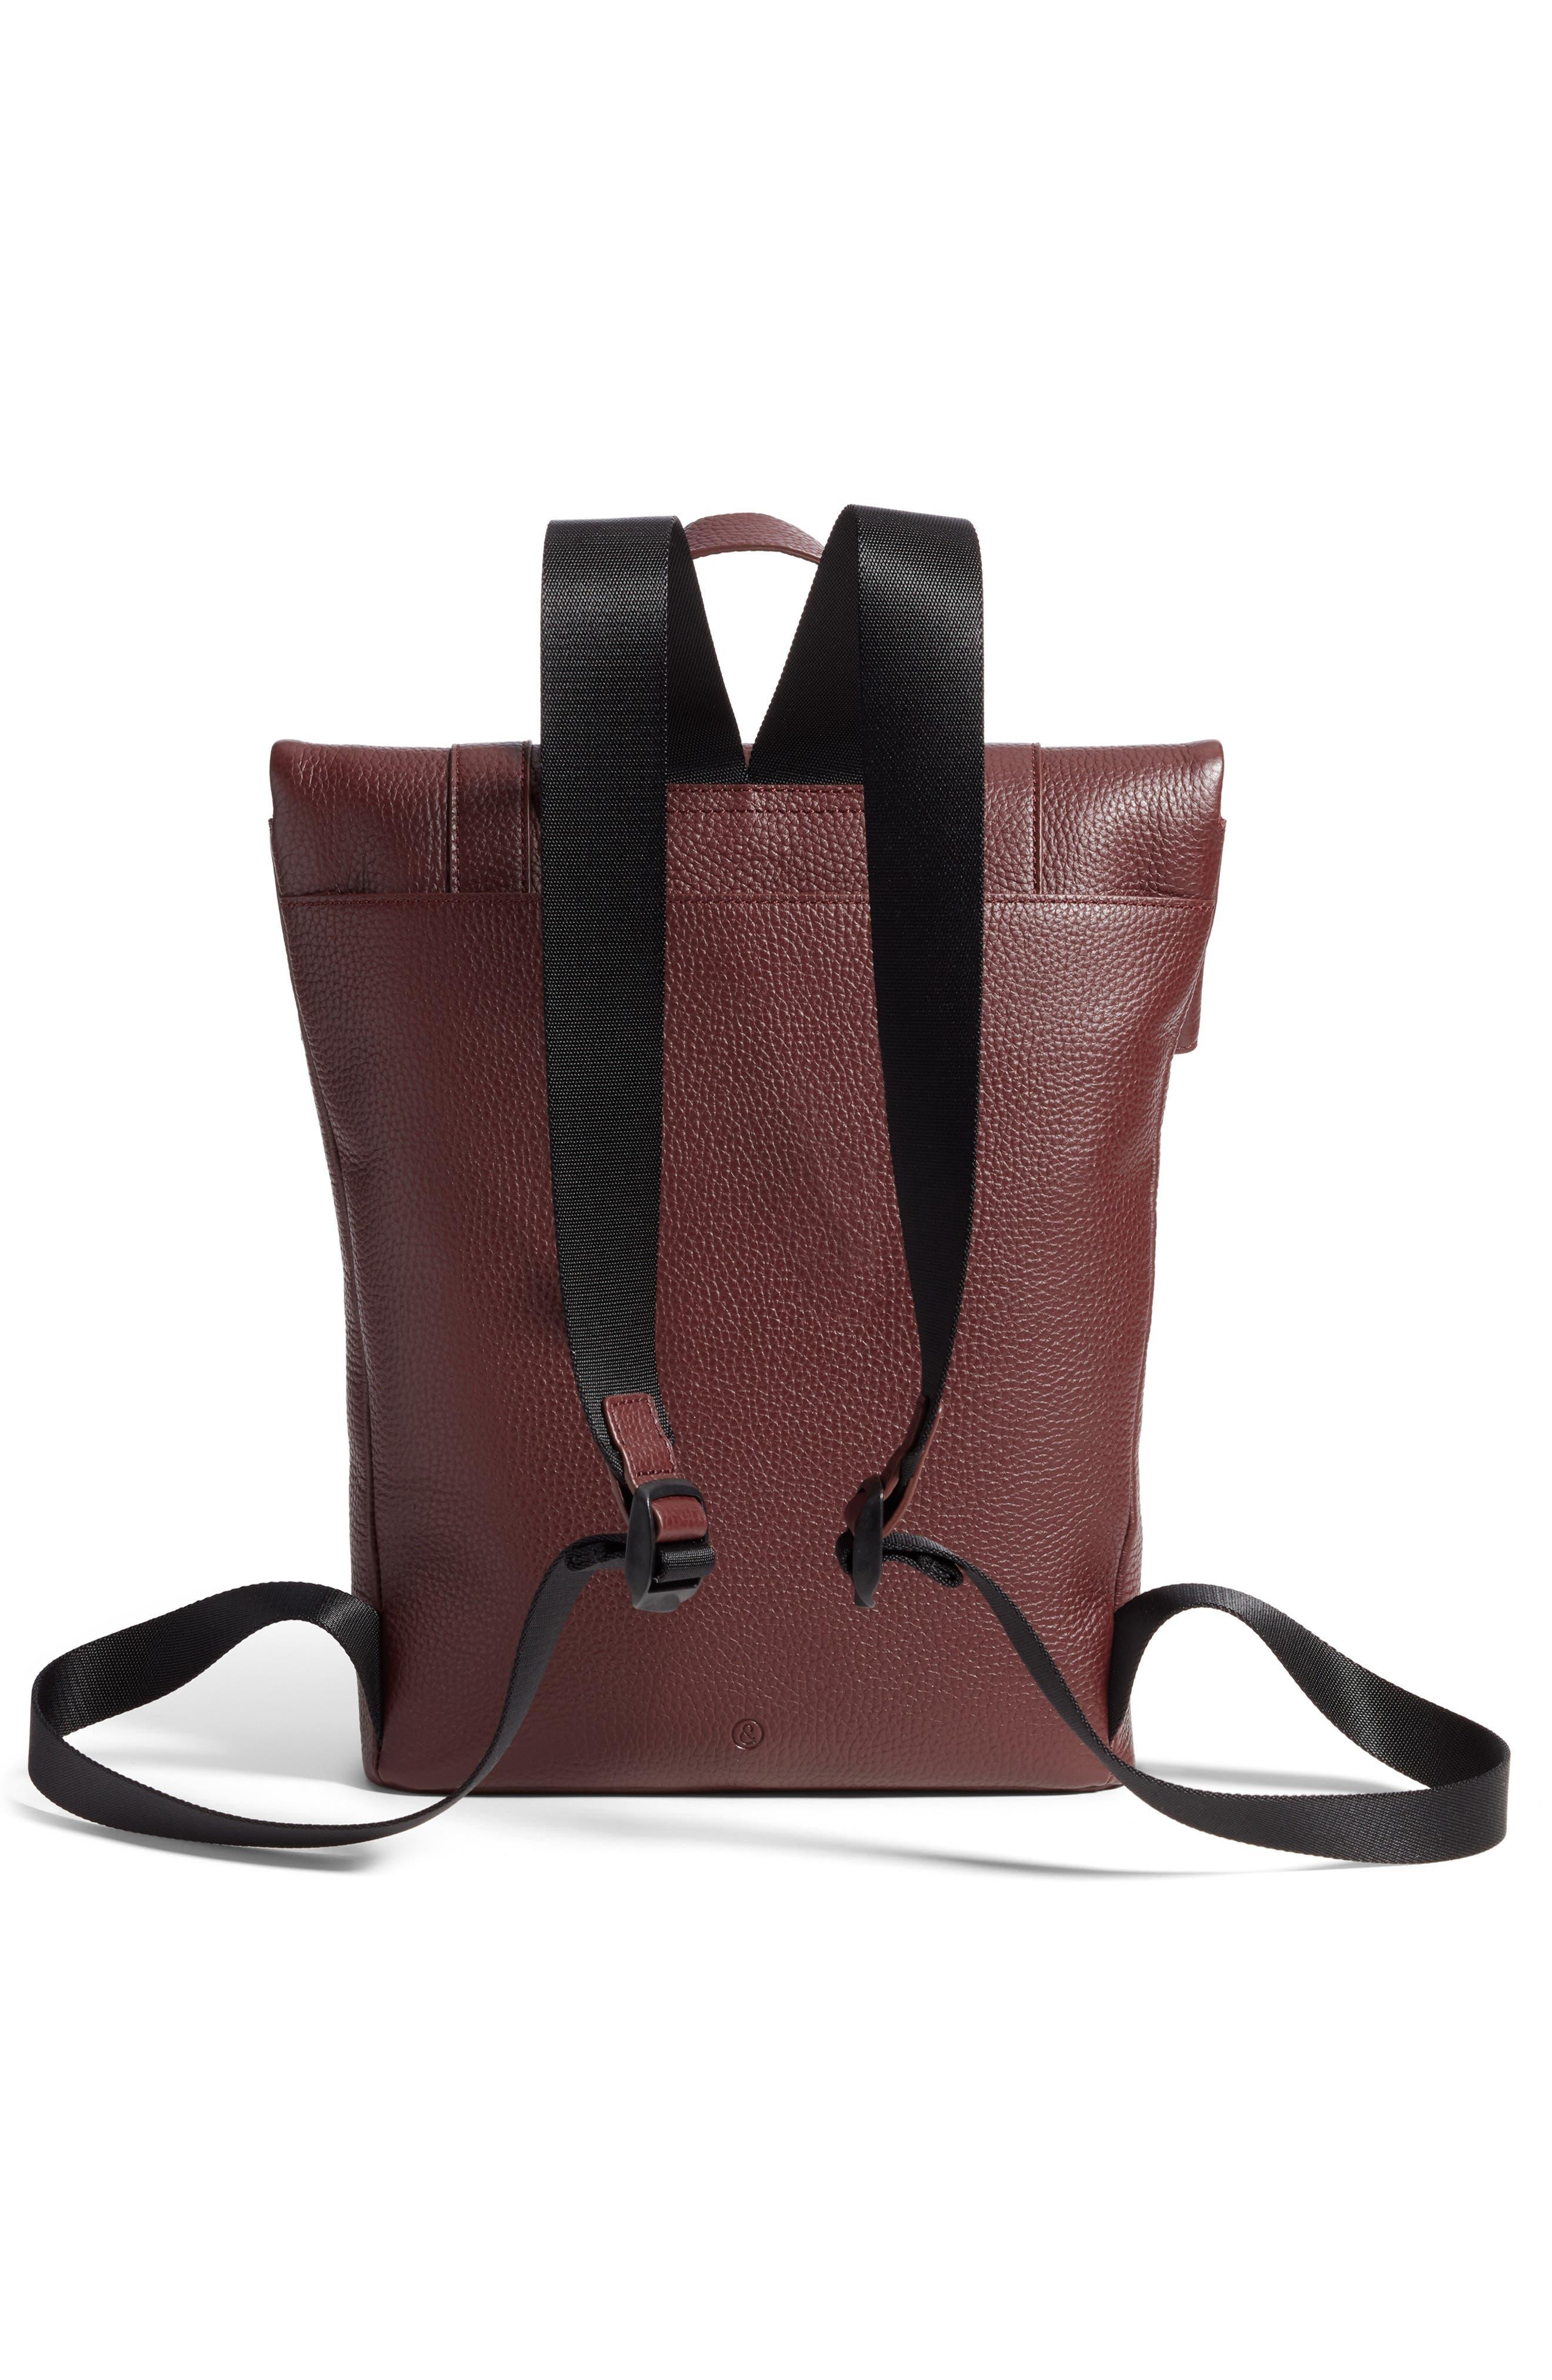 Remy Pebbled Leather Backpack,                             Alternate thumbnail 3, color,                             BURGUNDY FIG